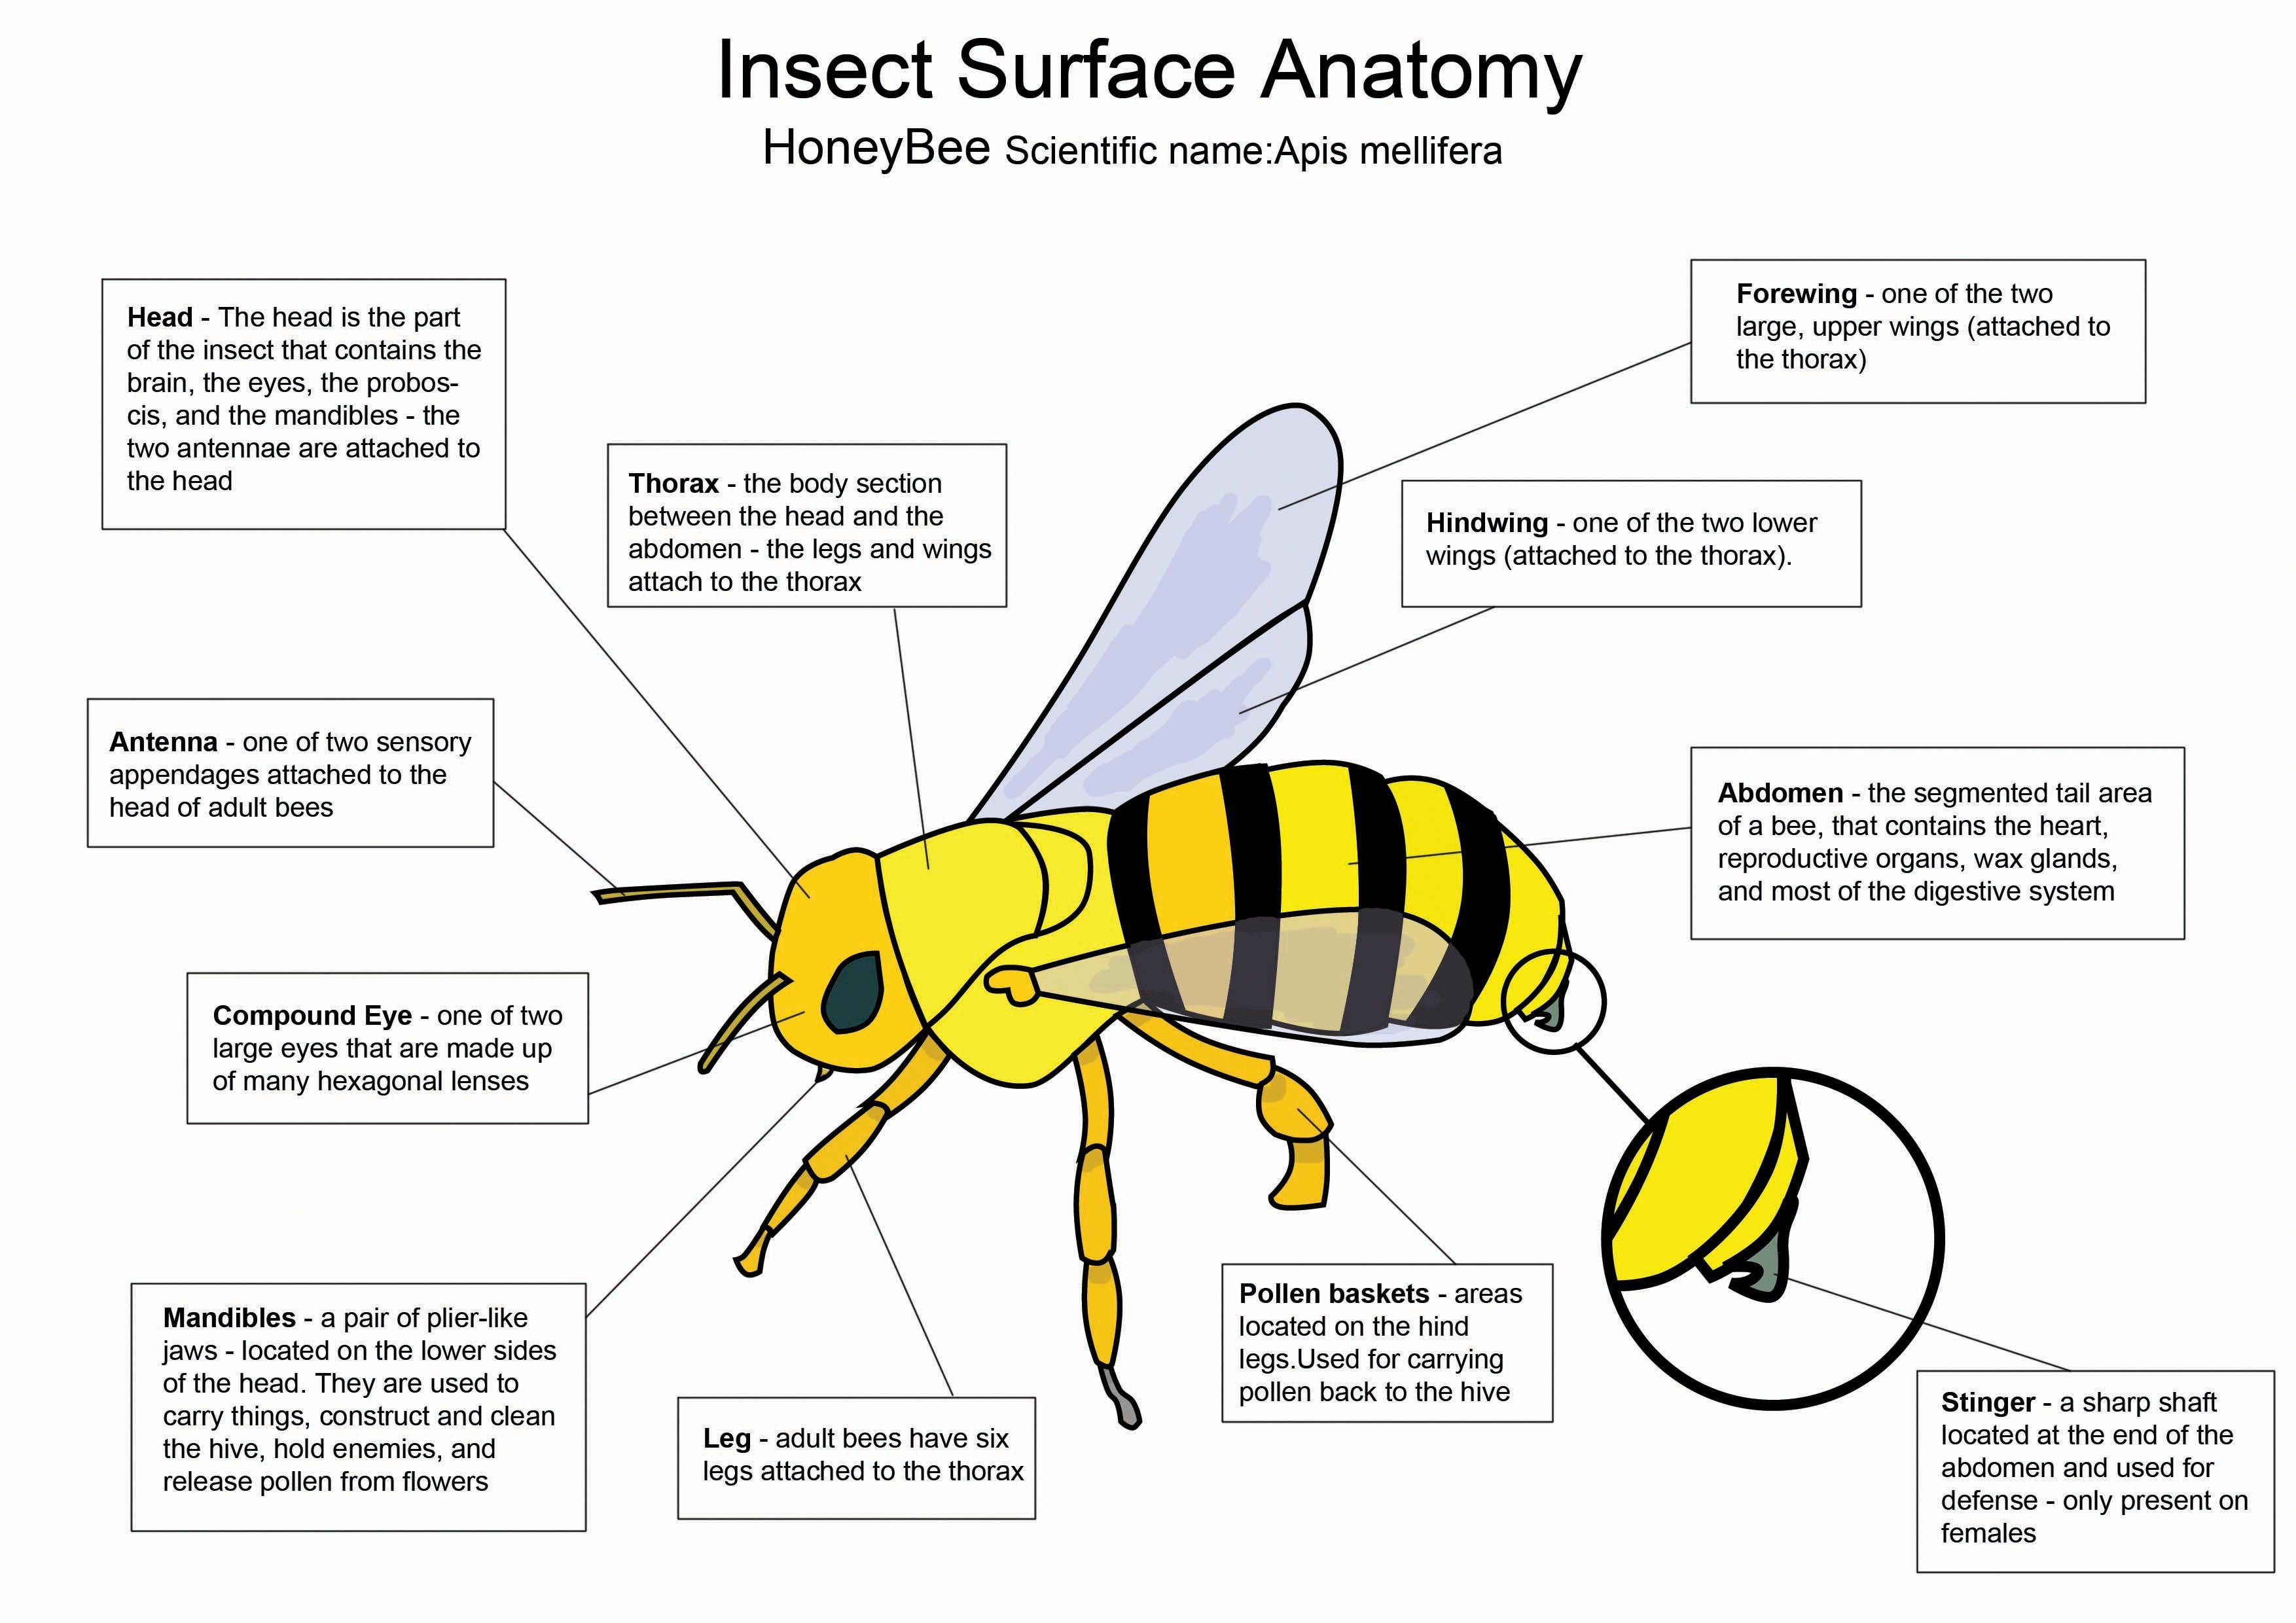 hight resolution of honey bee diagram by crazyhobo deviantart com on deviantart